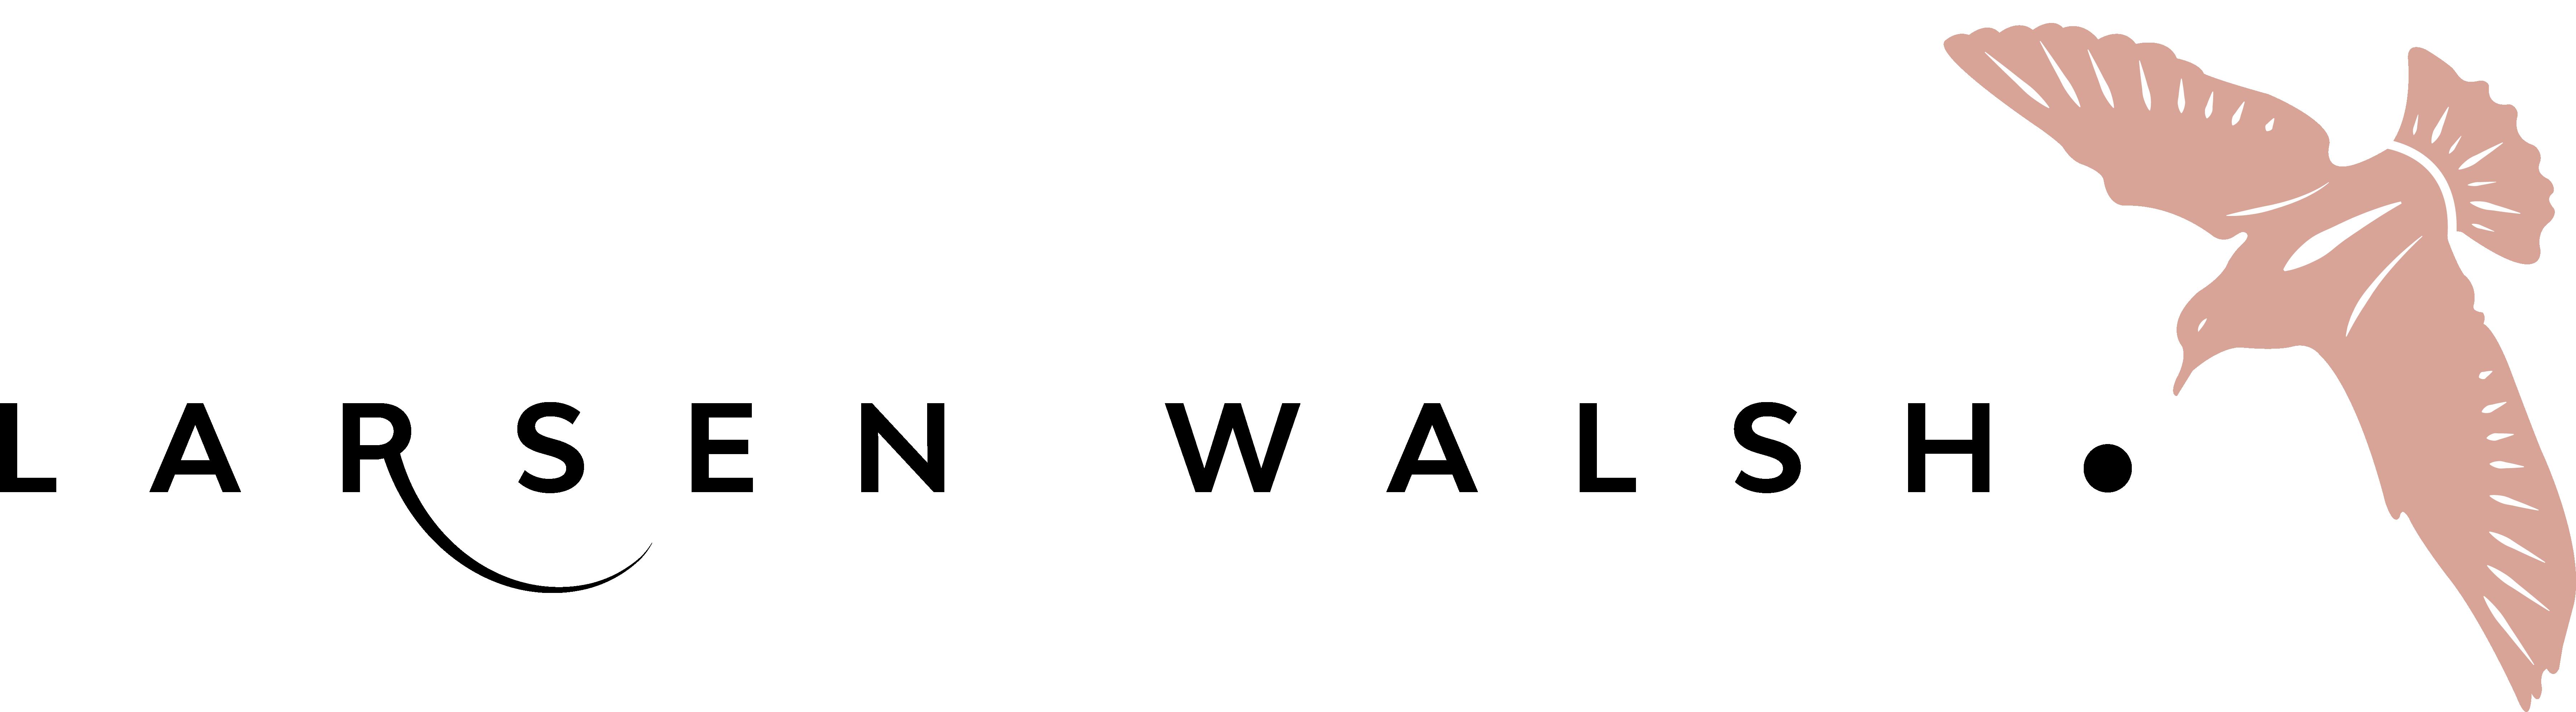 bondholder